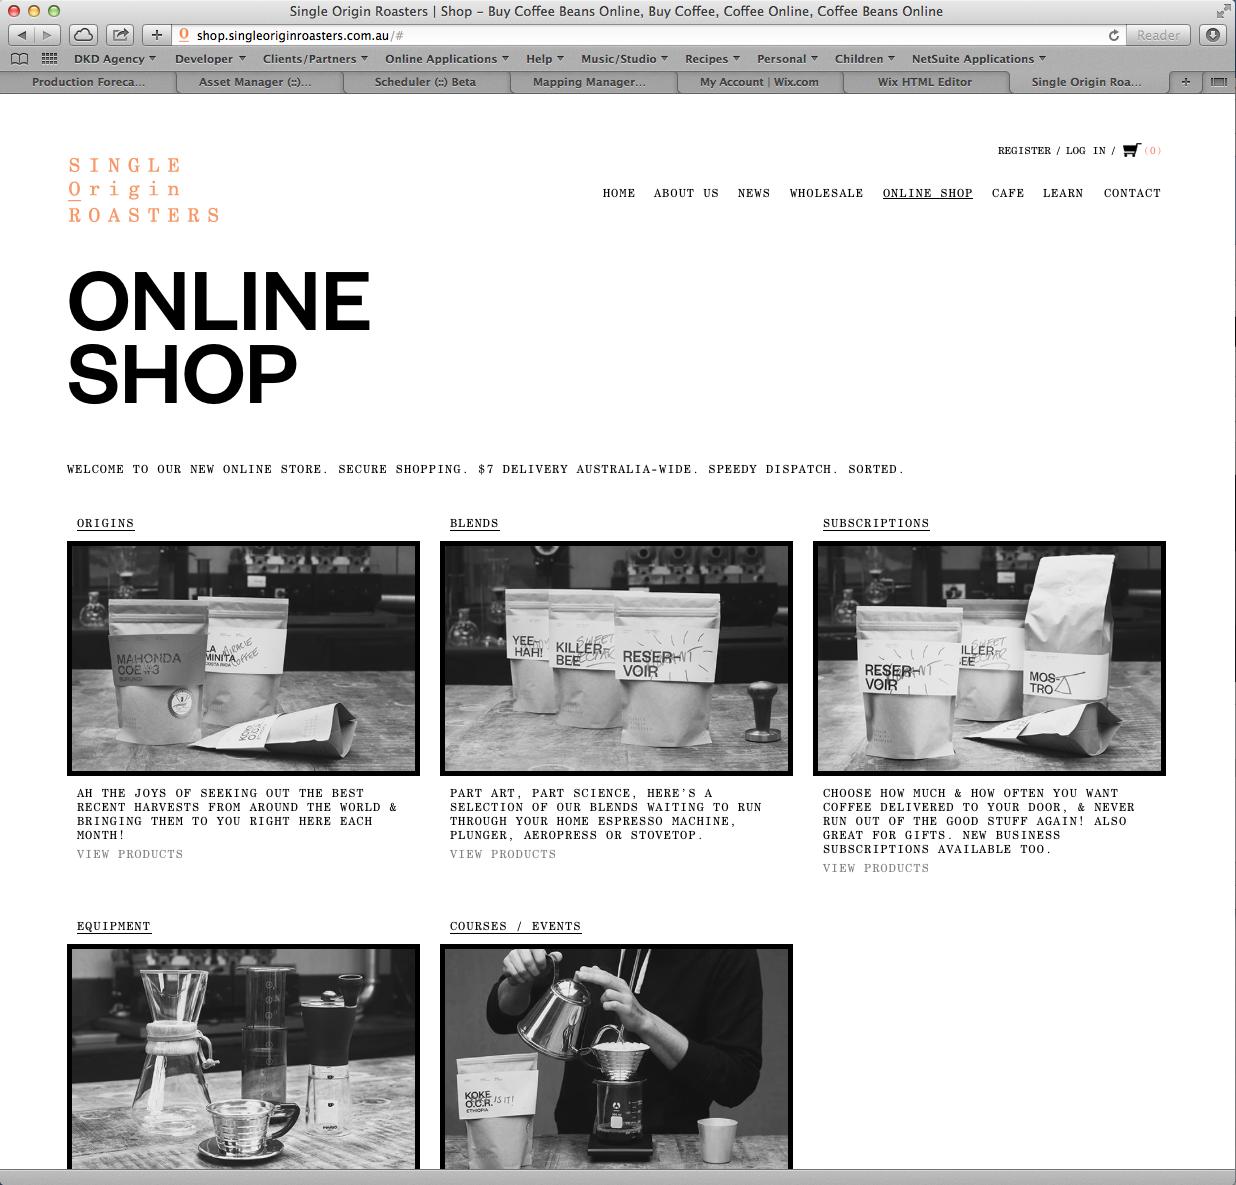 screenshot-webstore-05